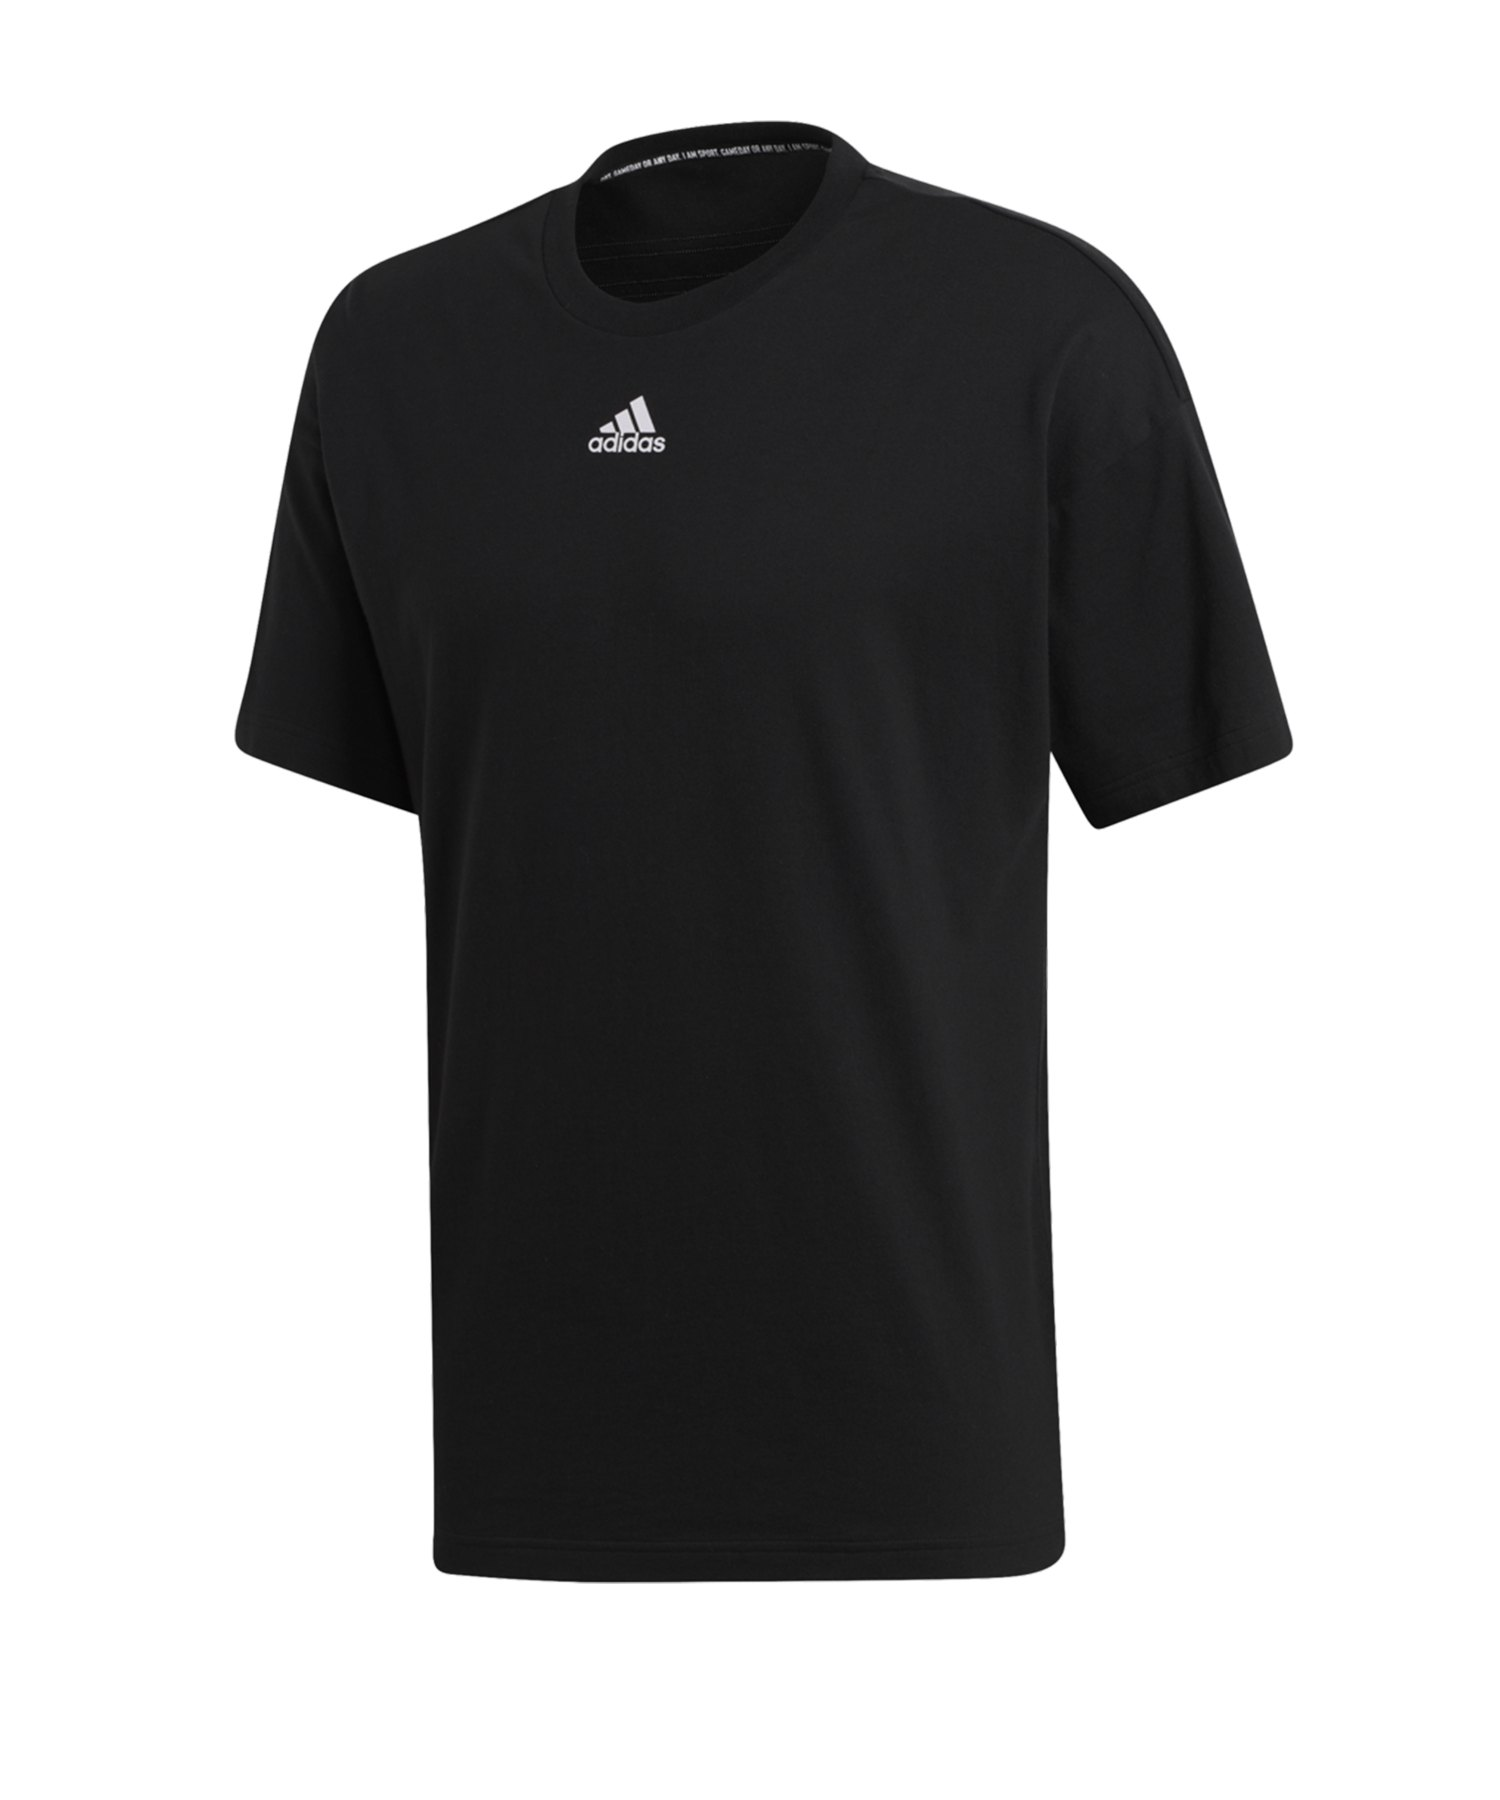 adidas MH 3 Stripes T-Shirt Schwarz - schwarz